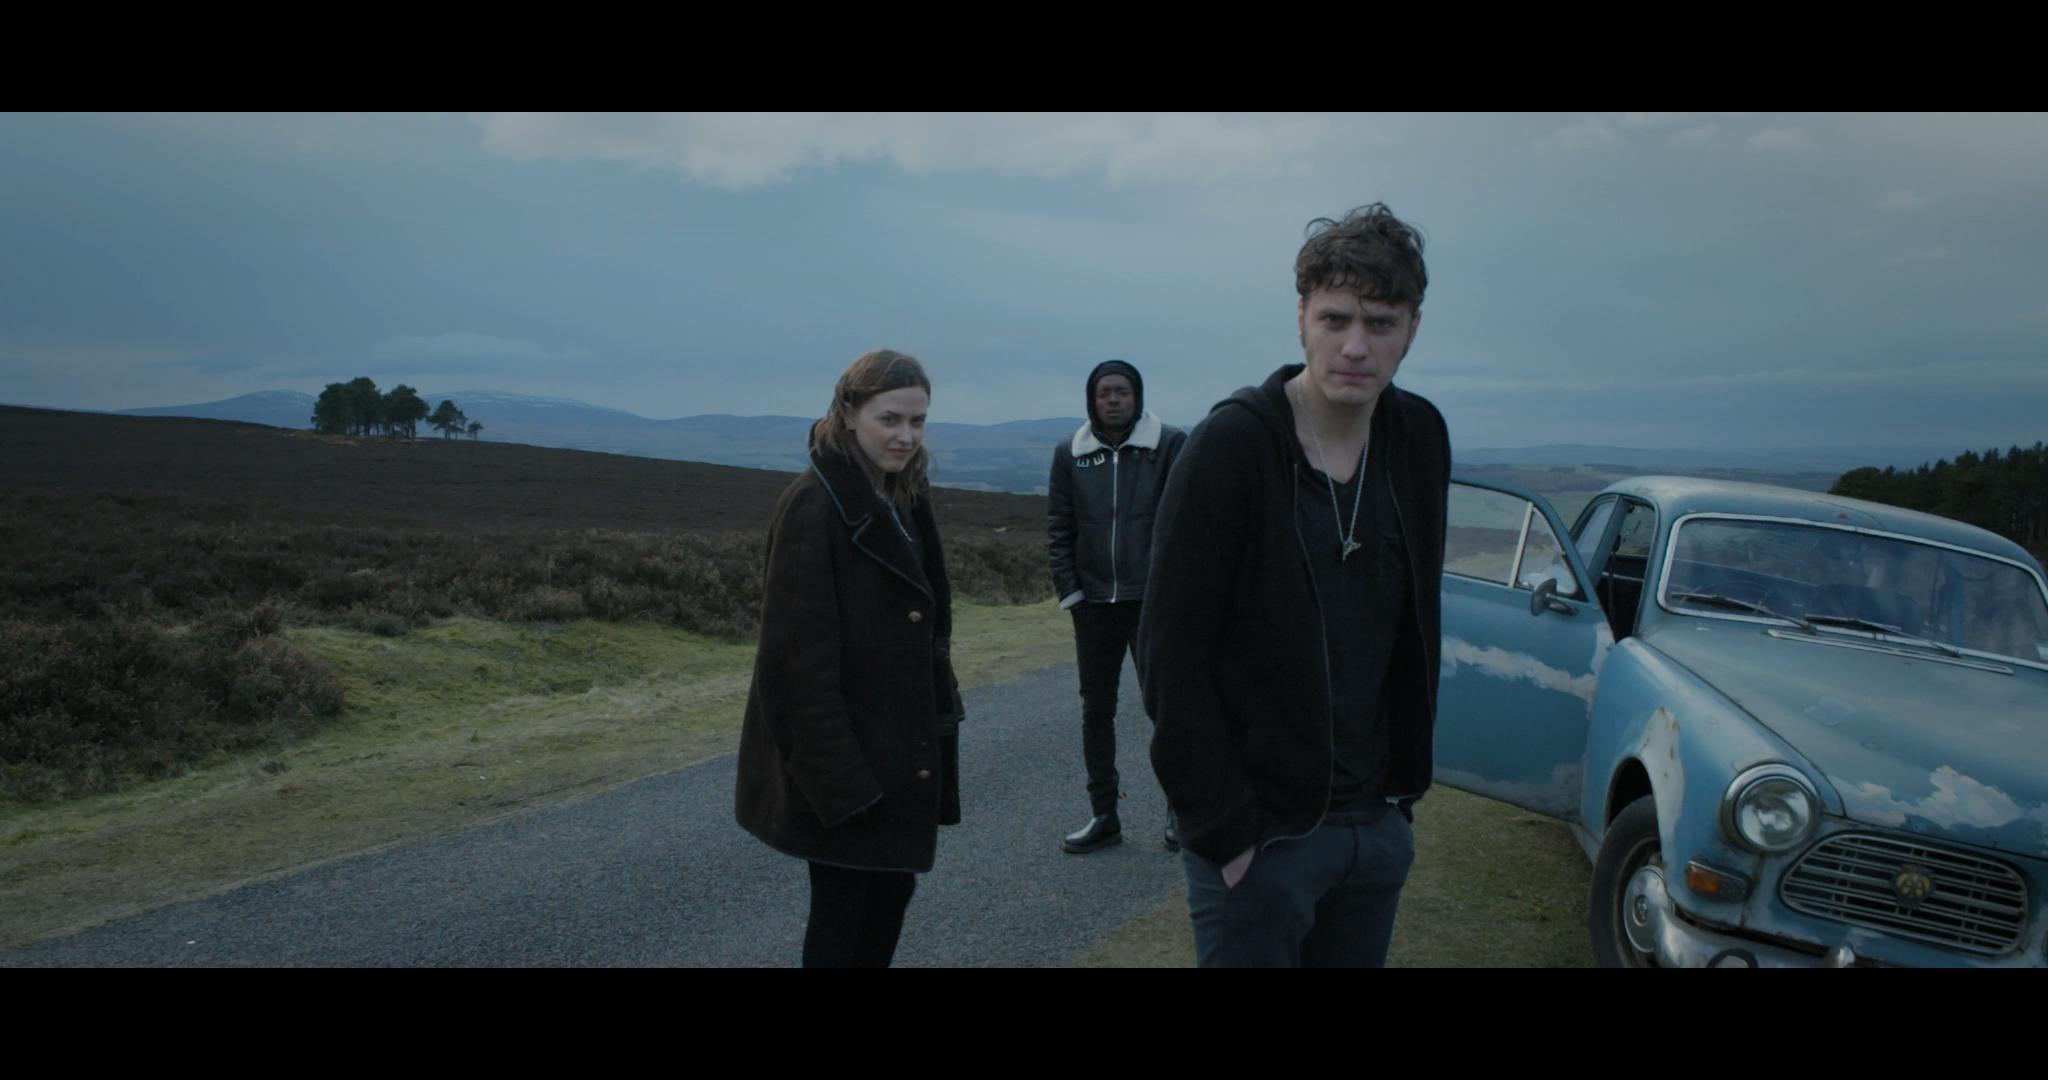 Burning Men (l-r) Elinor Crwley as SUSIE, Ed Hayter as RAY, Aki Omoshaybi as DON, moors1 Still053.jpg